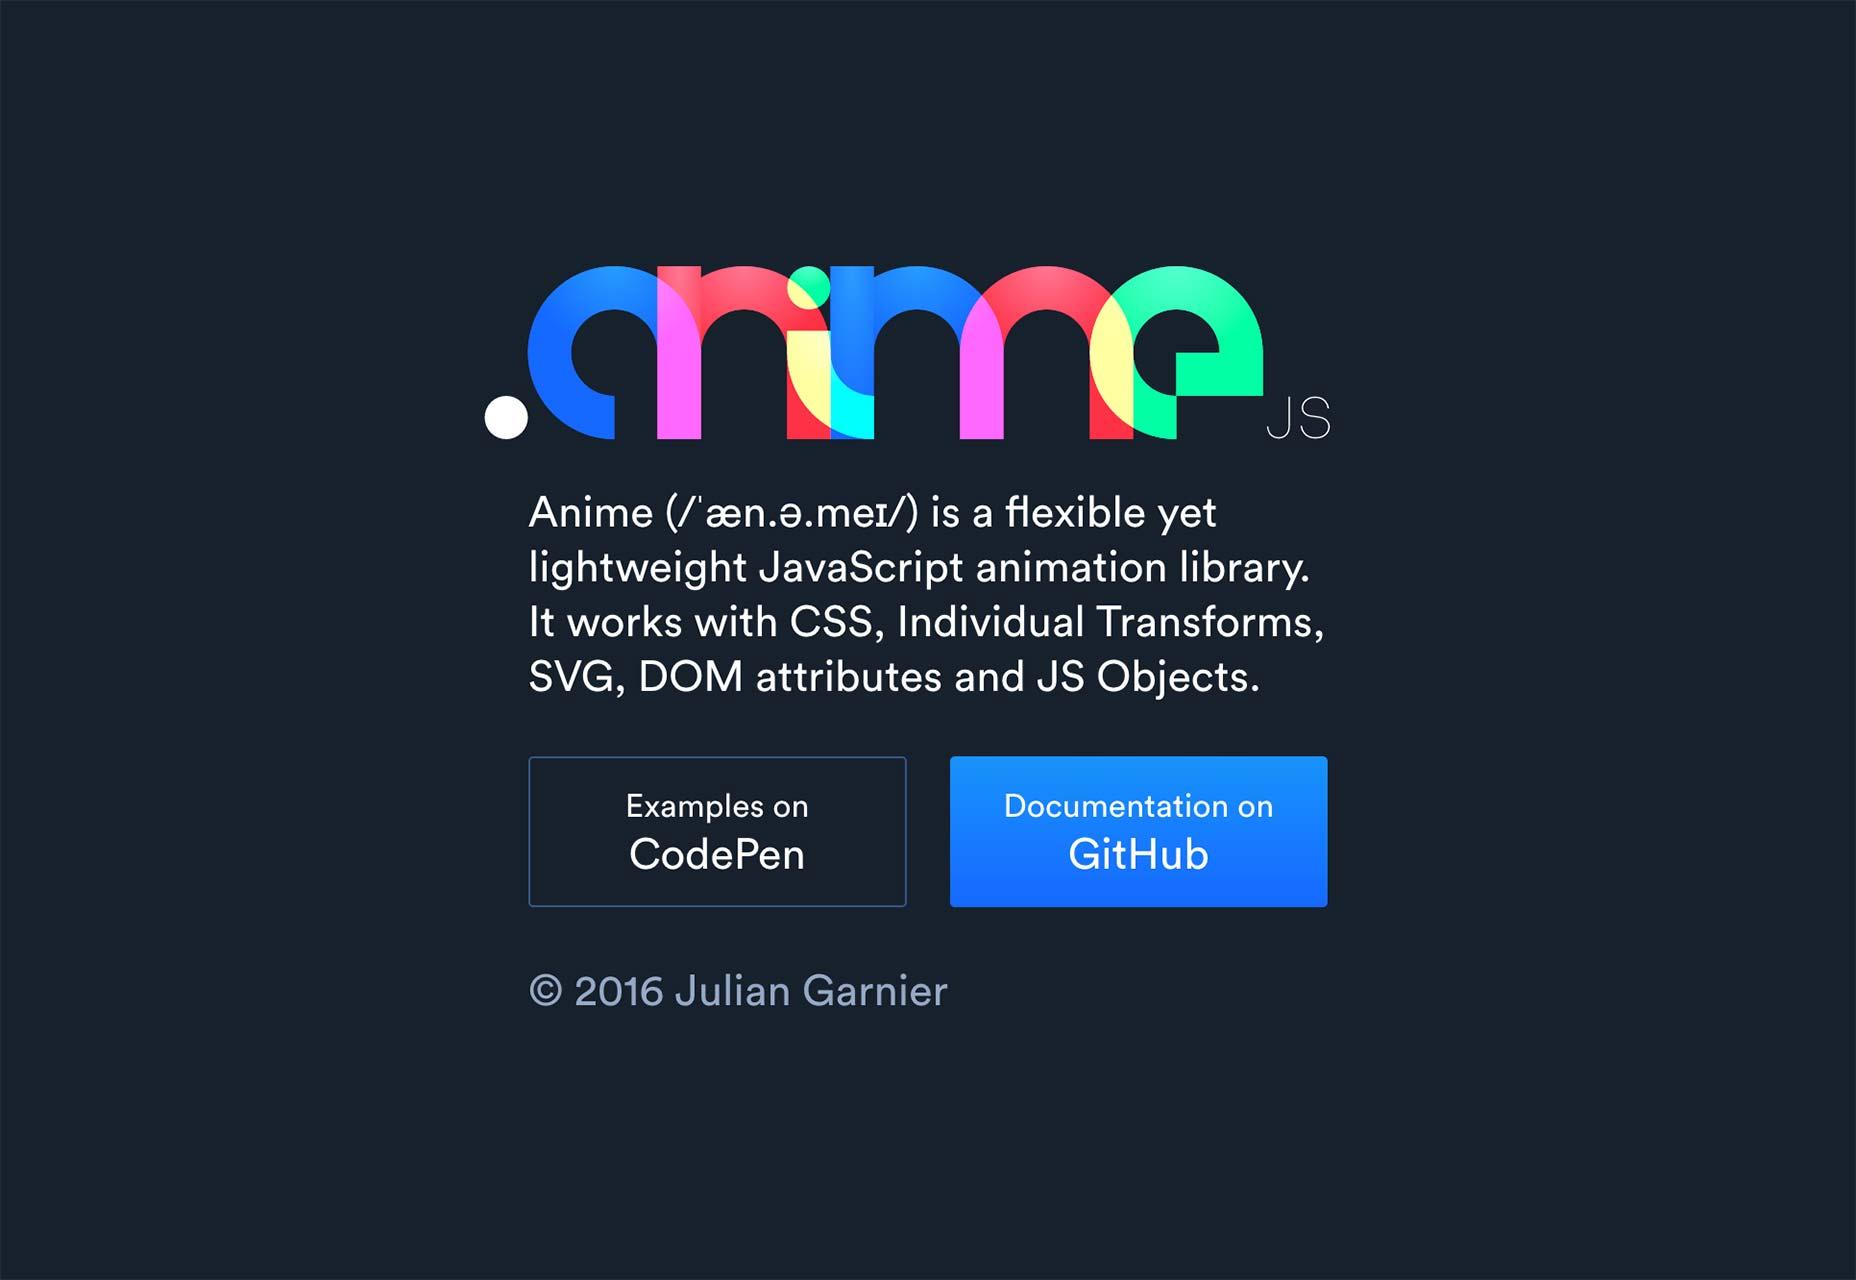 anime_js